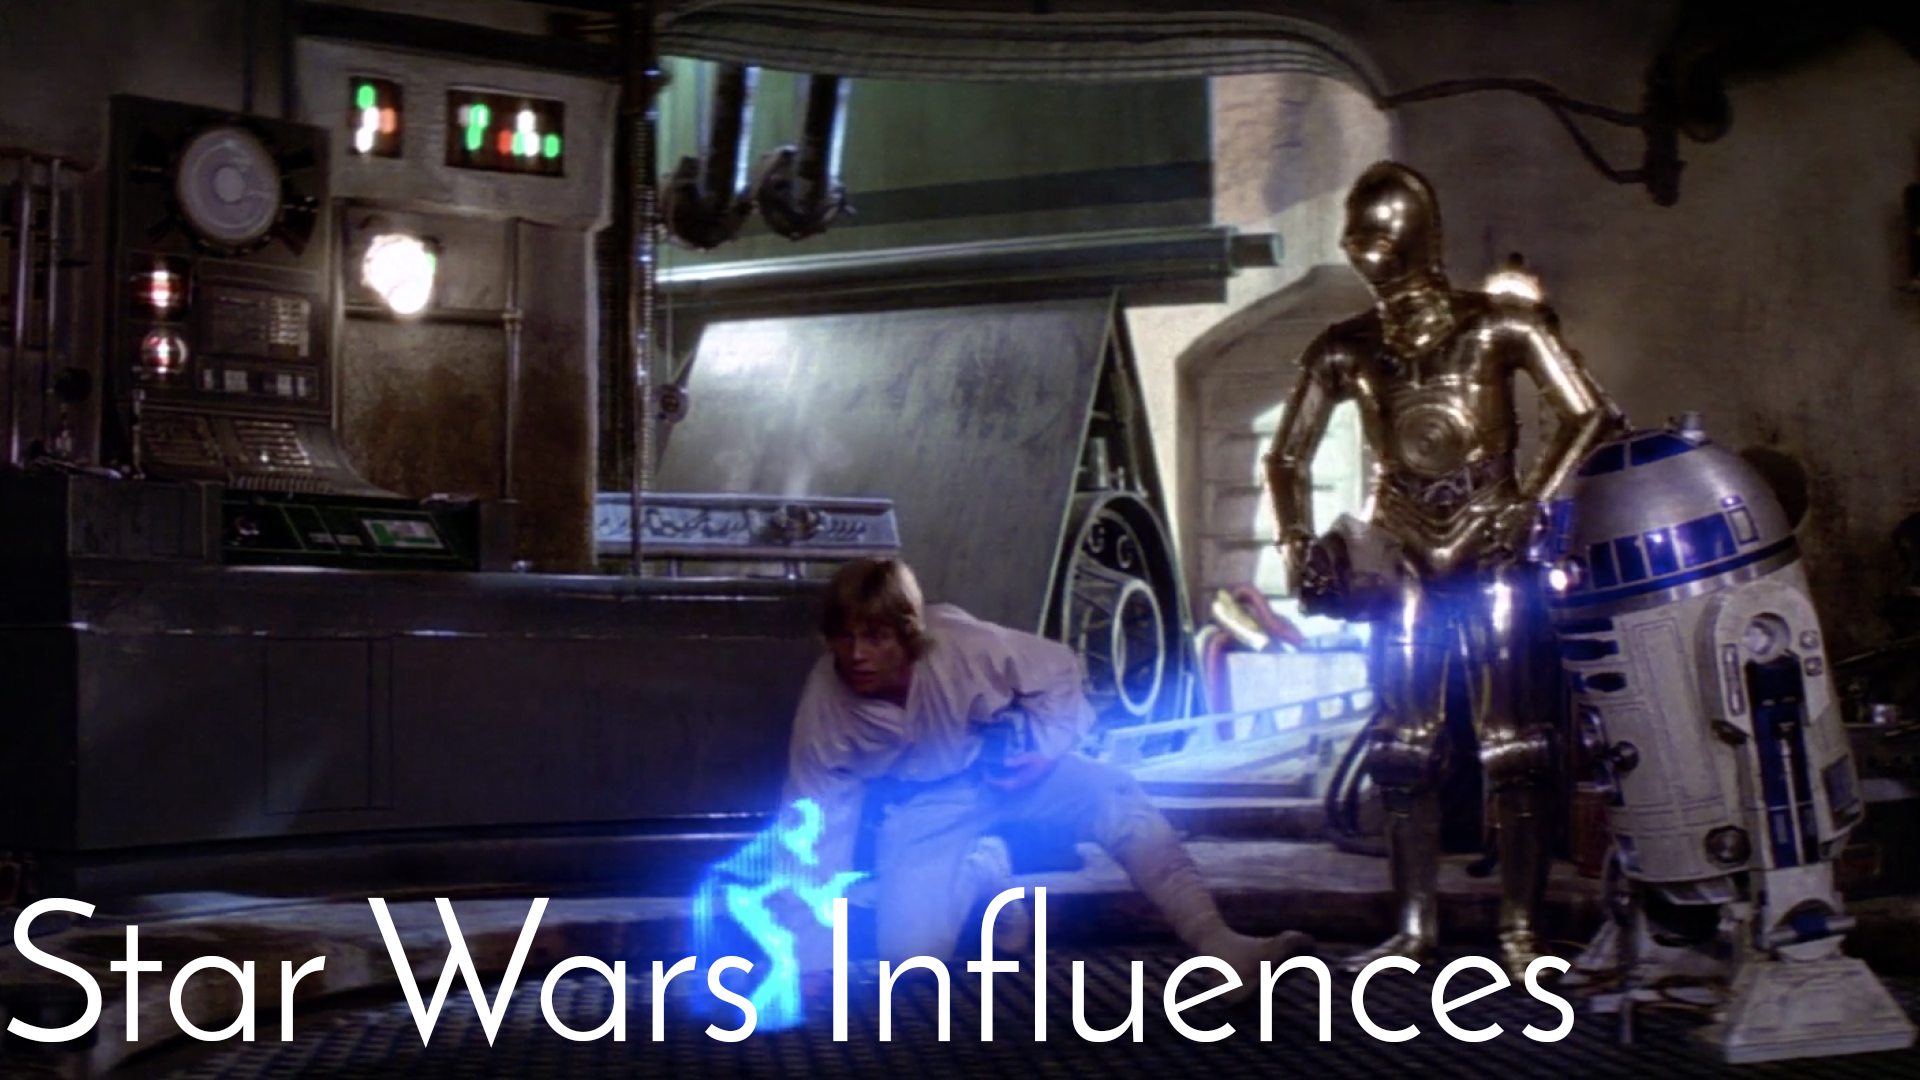 Star Wars Influences